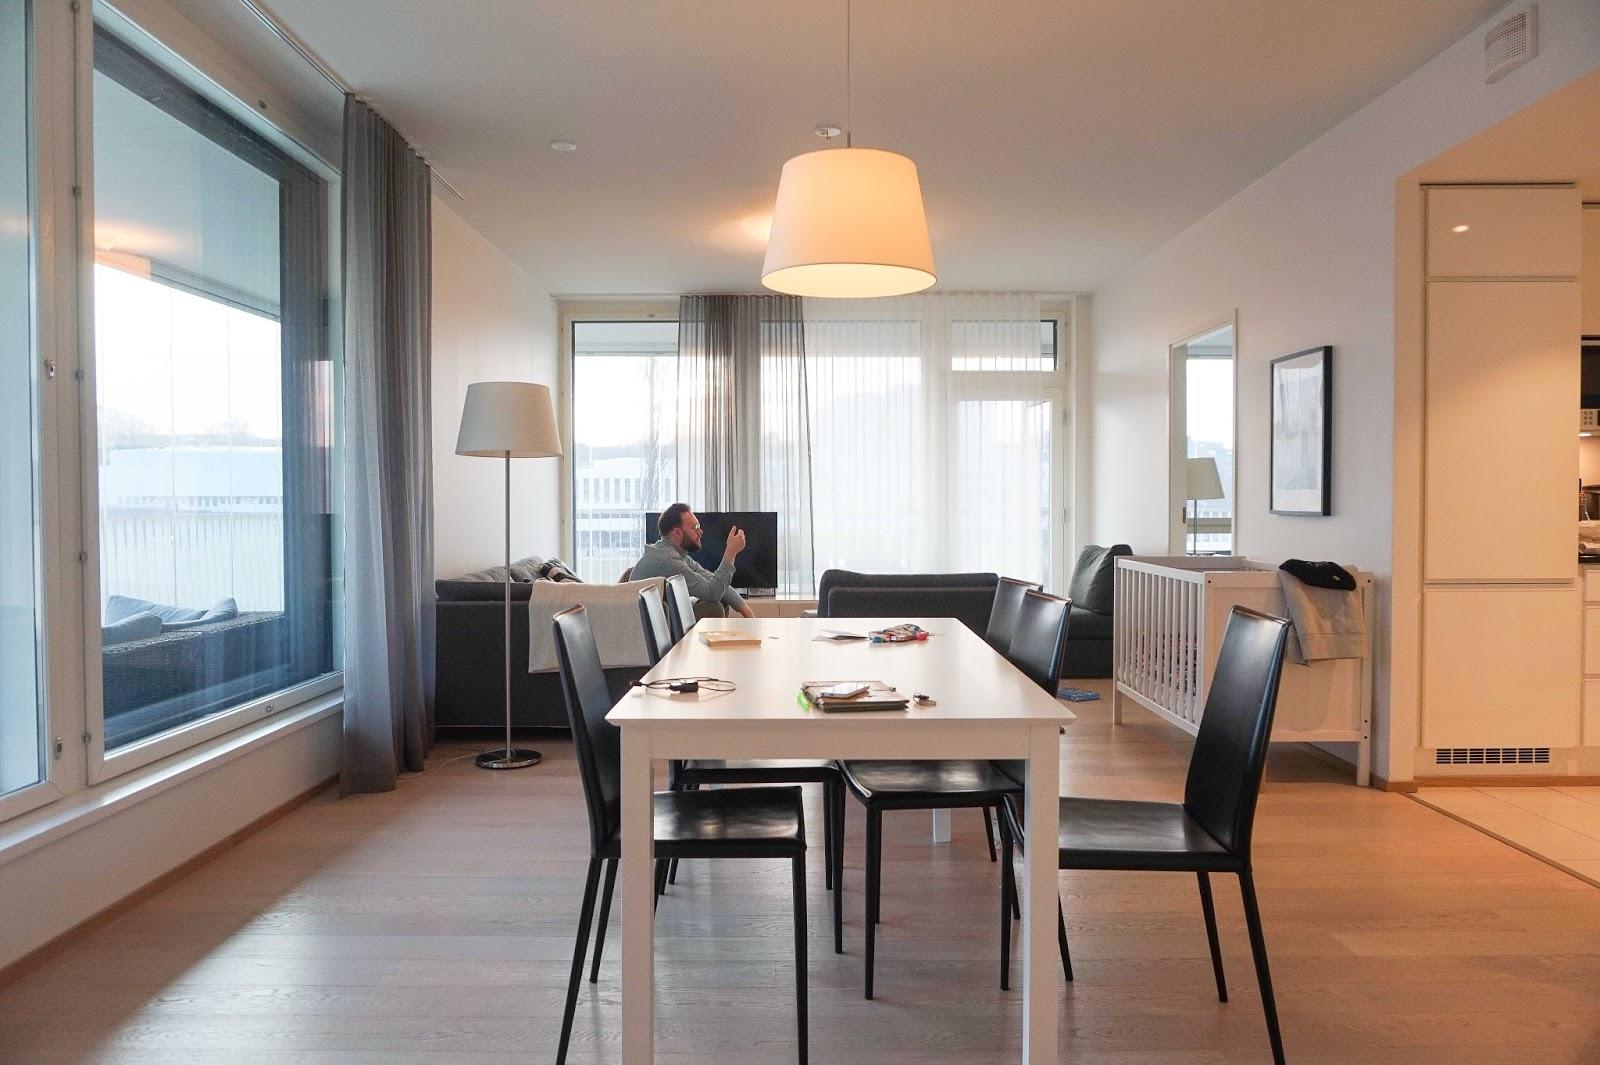 Finnish Interior Design side street style: for the love of finnish interior design